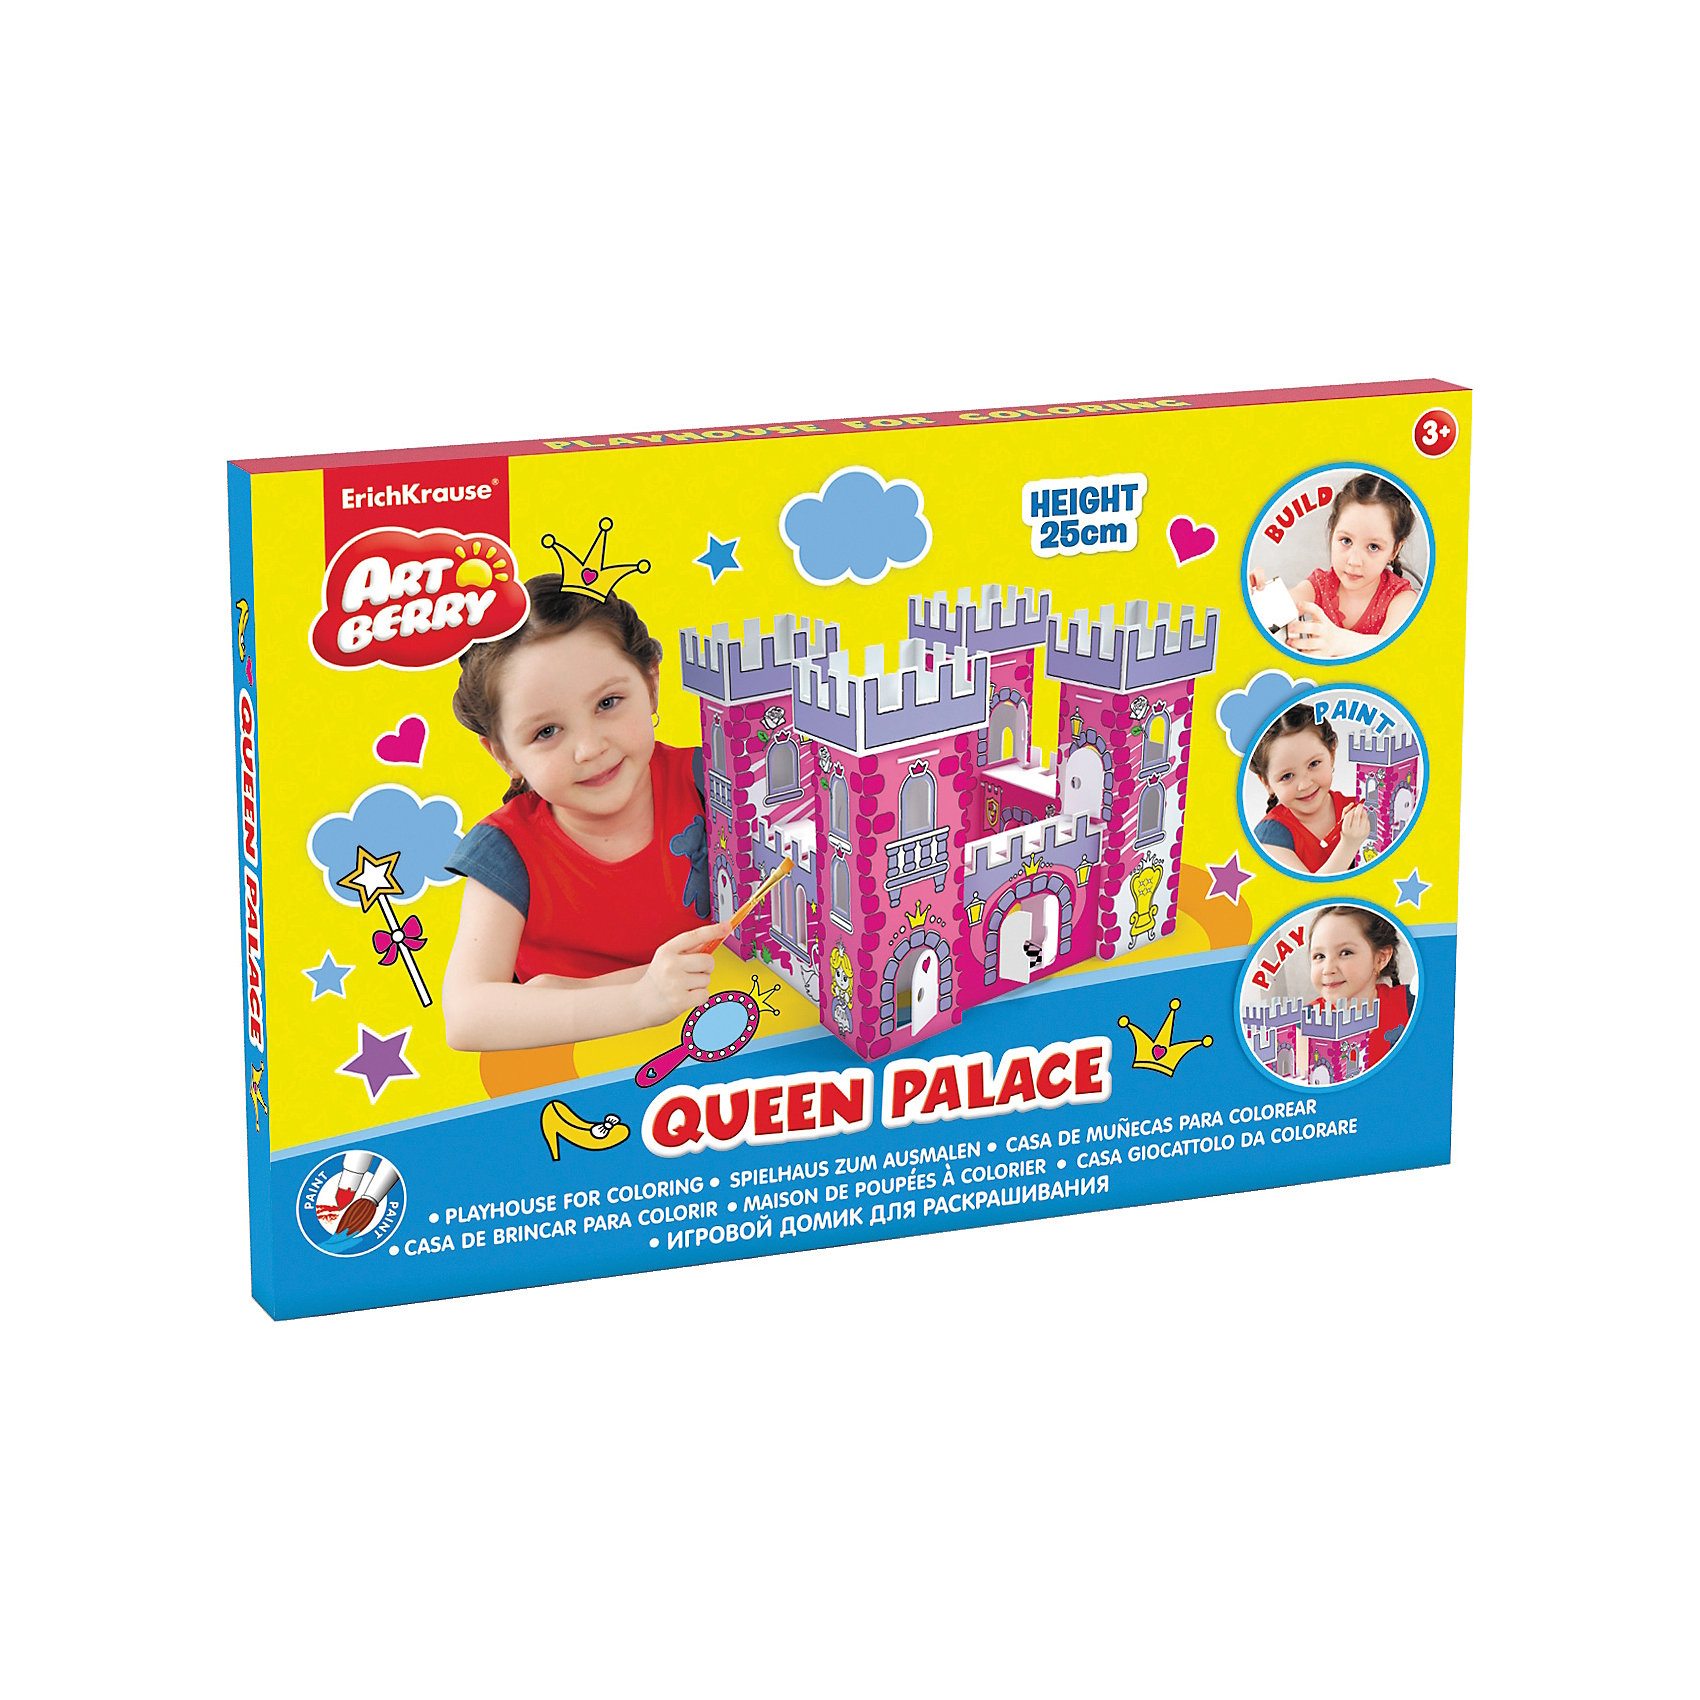 ErichKrause Набор для раскрашивания Замок принцессы, Artberry barneybuddy barneybuddy игрушки для ванны стикеры замок принцессы